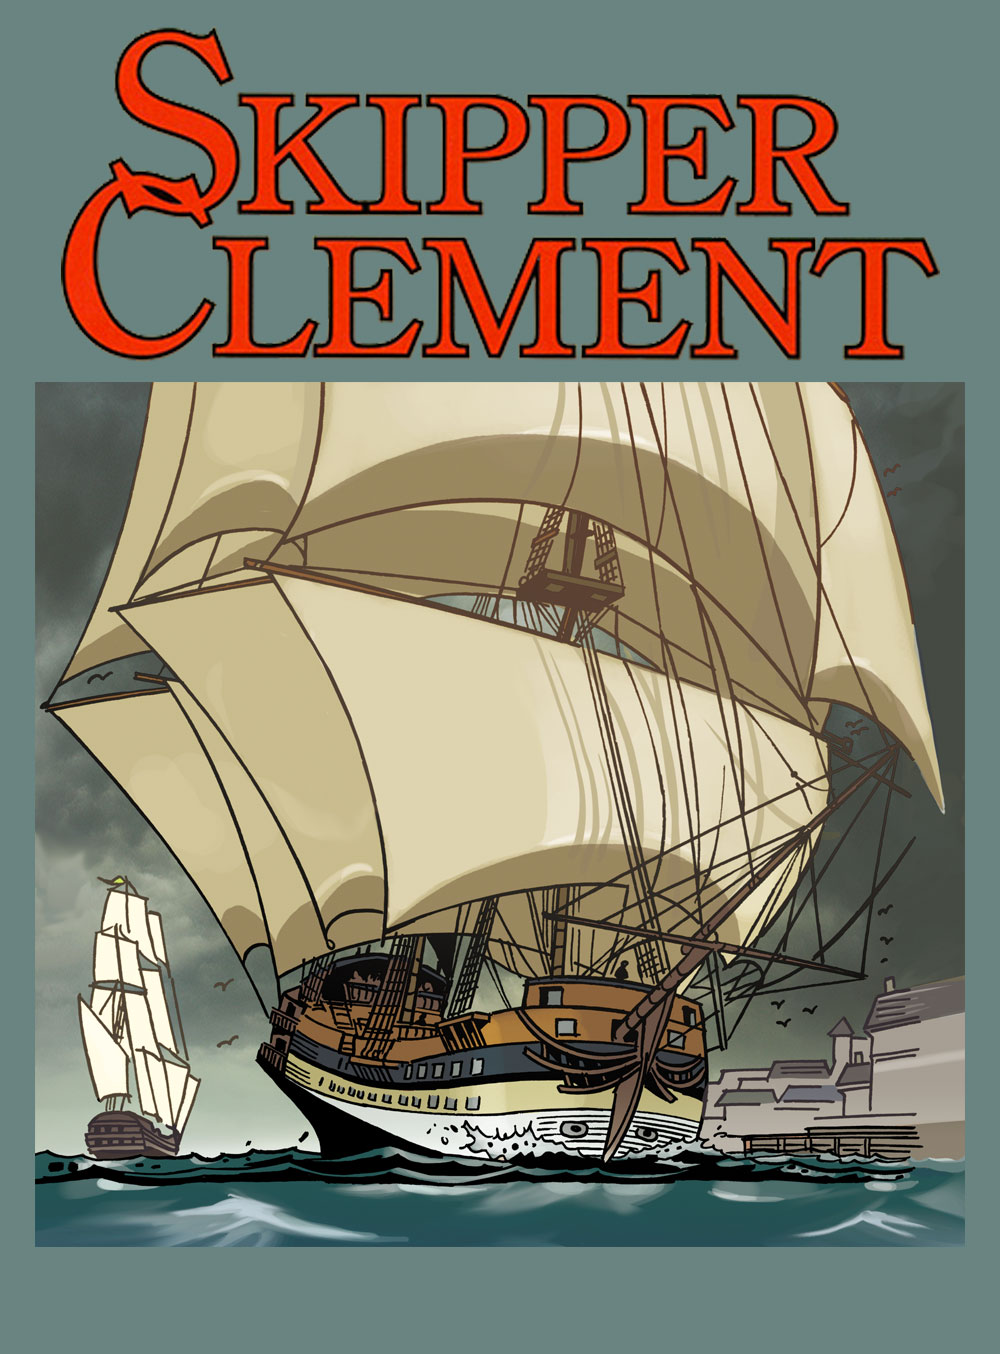 skipper-clement